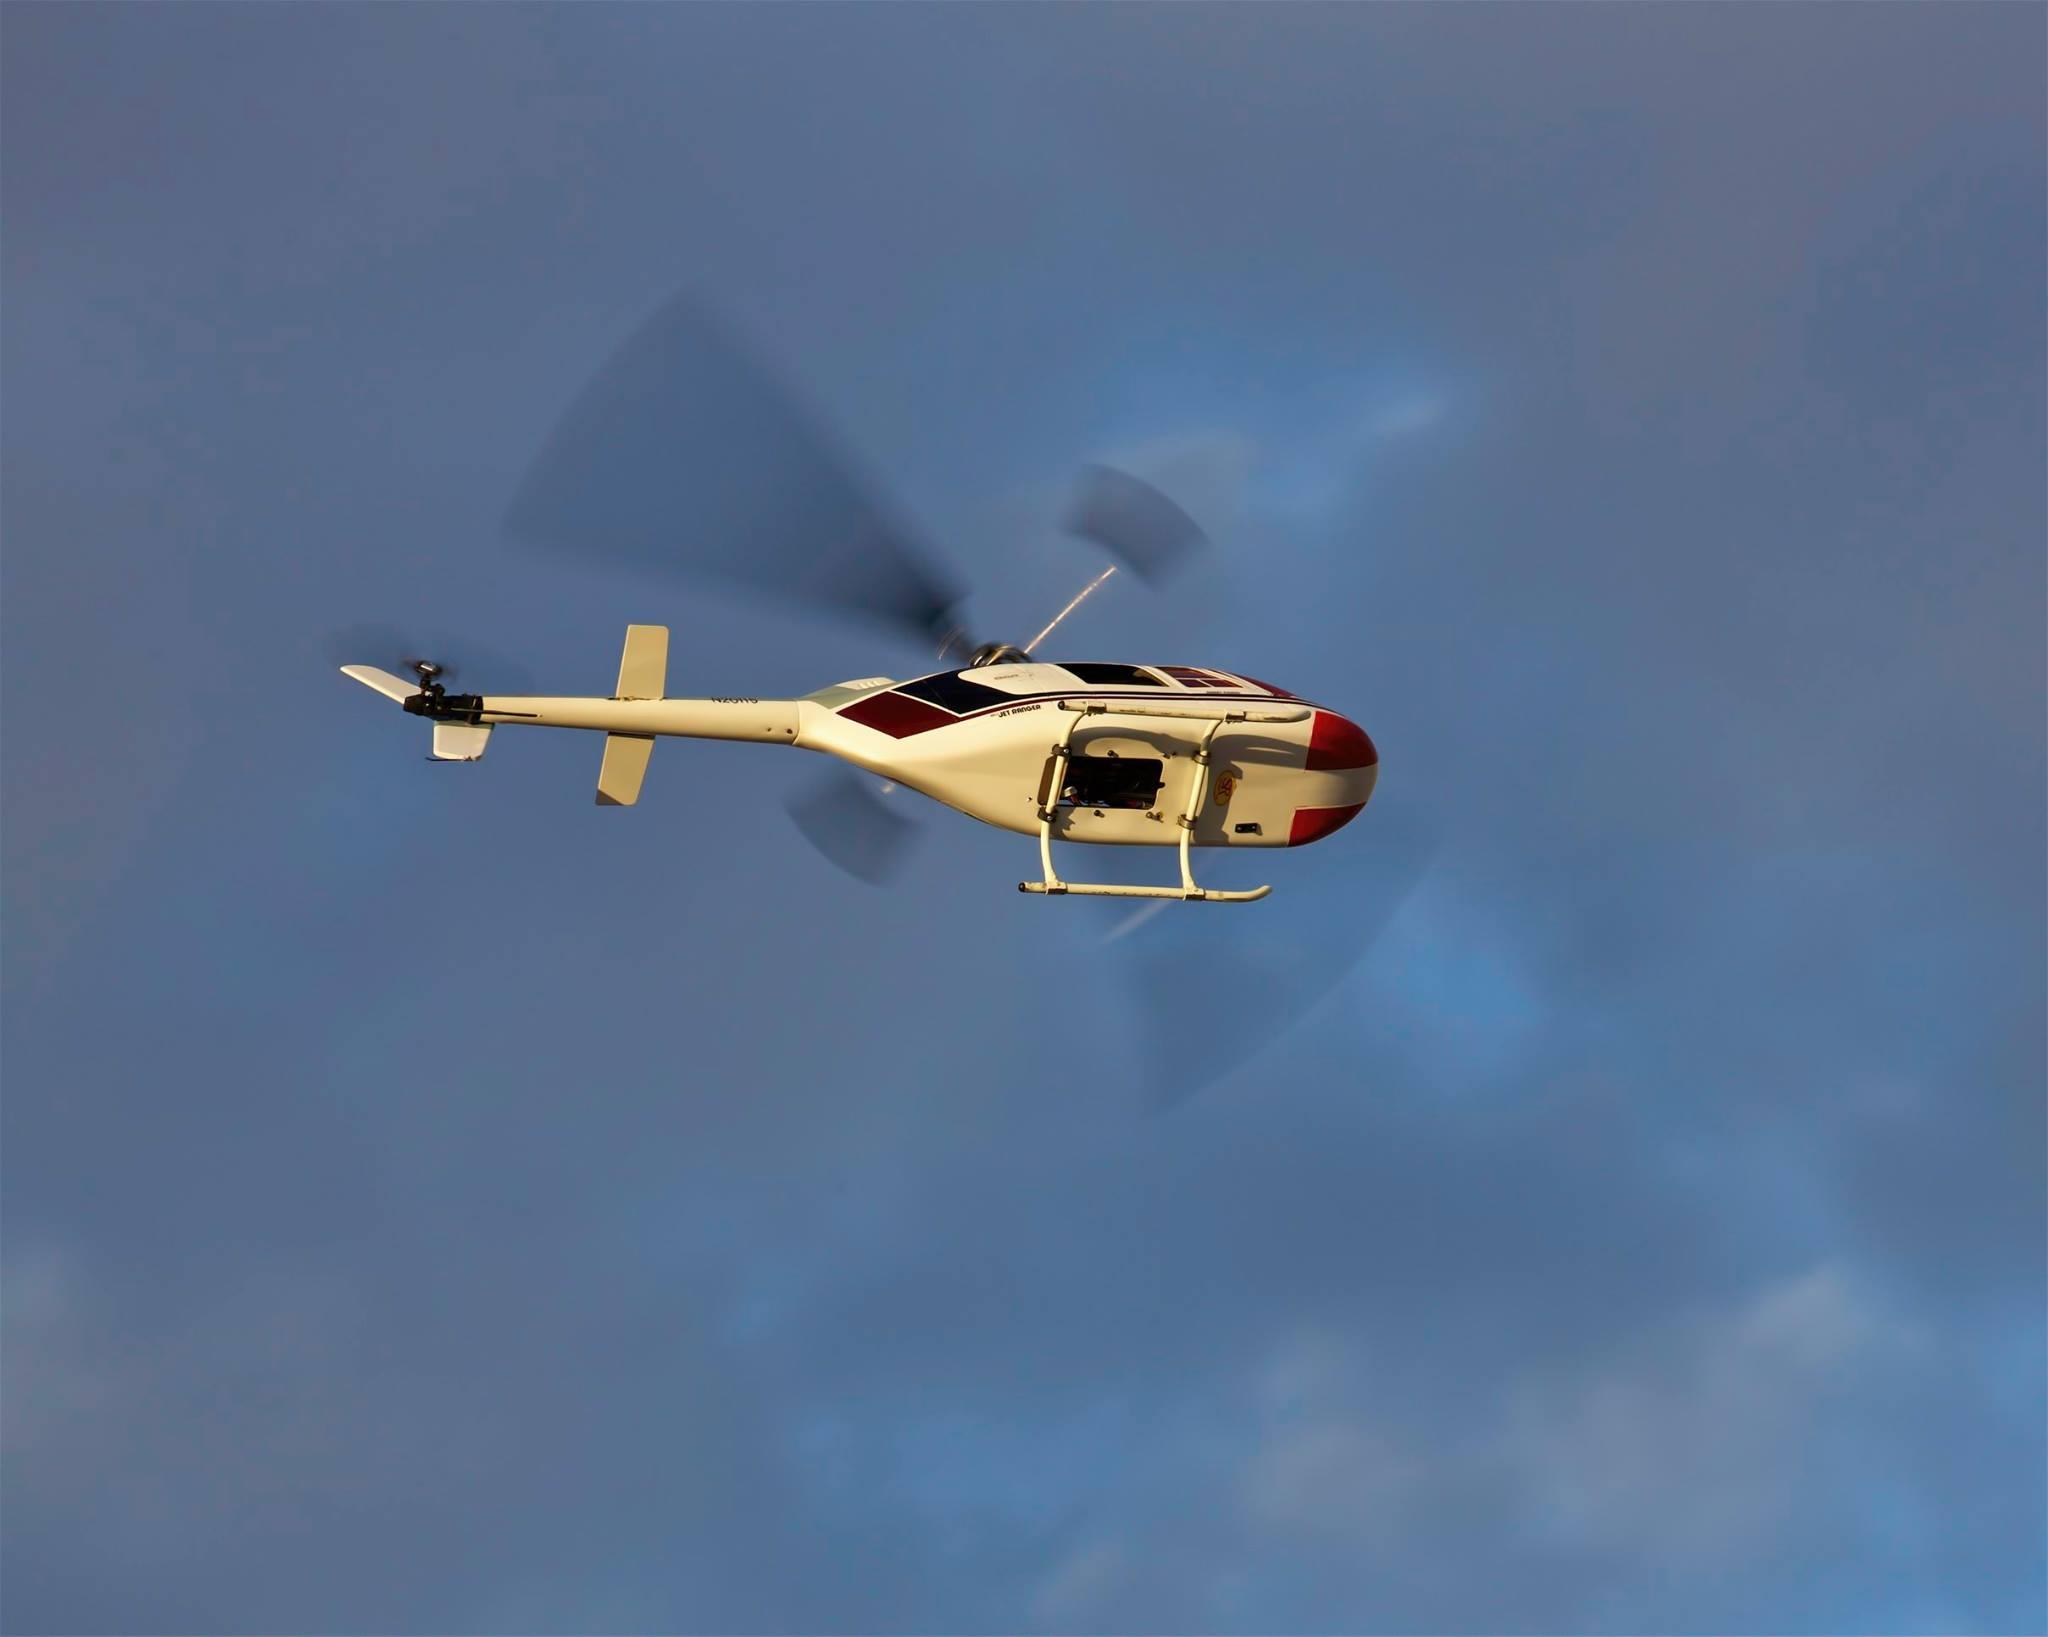 Ranger flies again over the LVSC field 2017